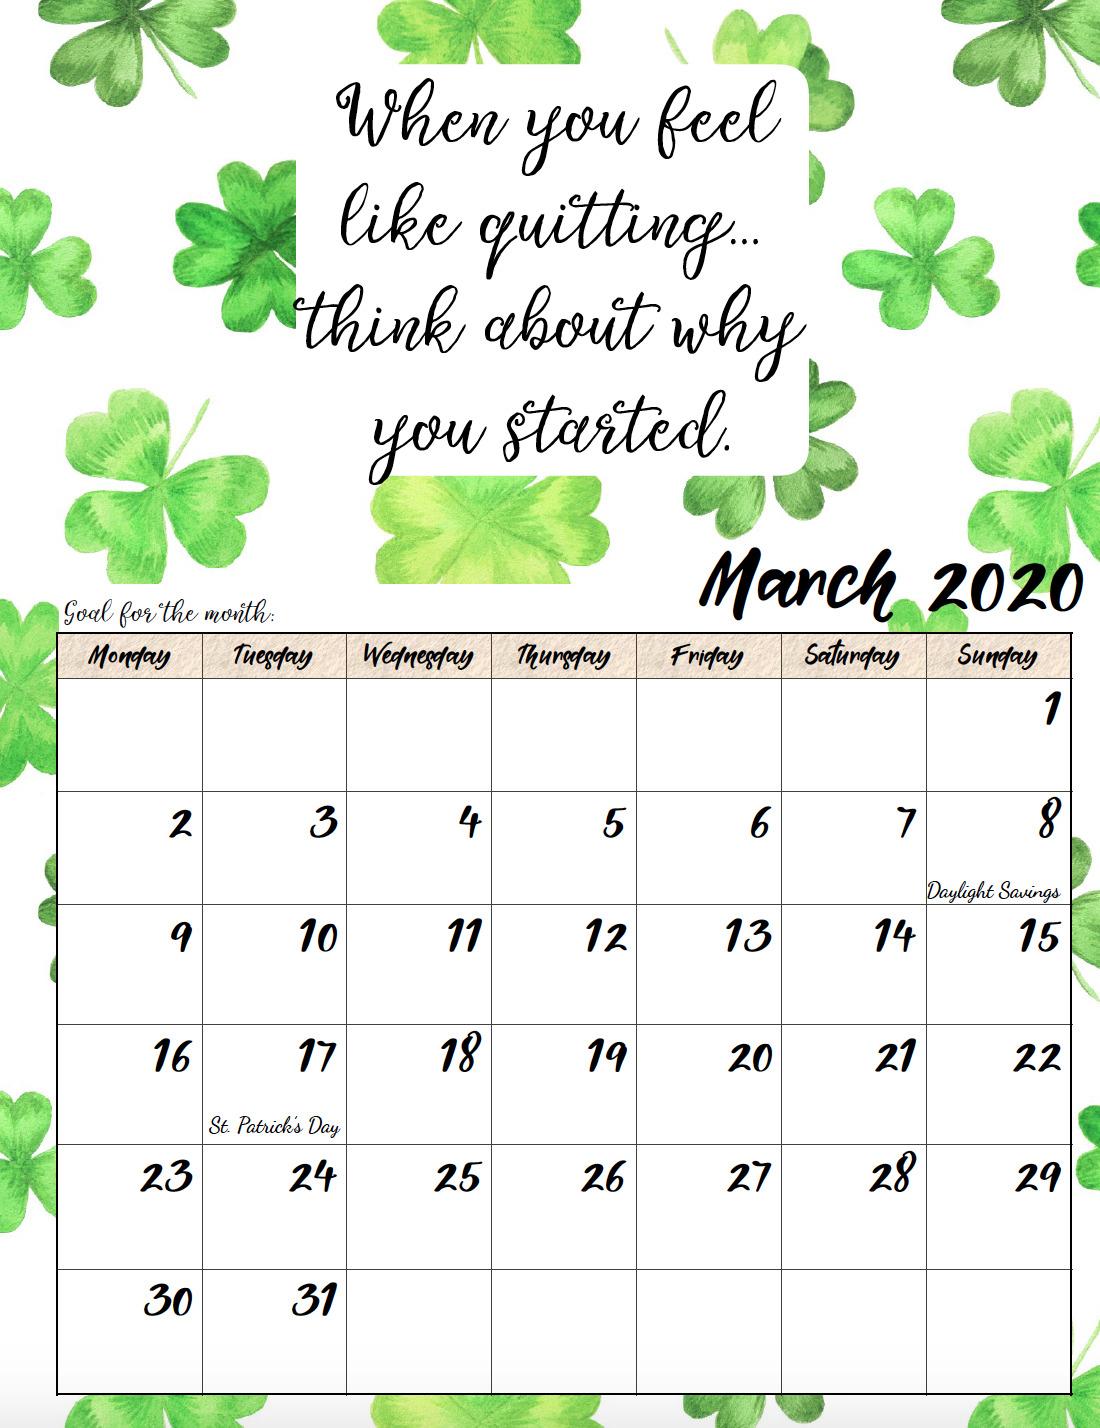 Free printable Monday start March 2020 calendar.